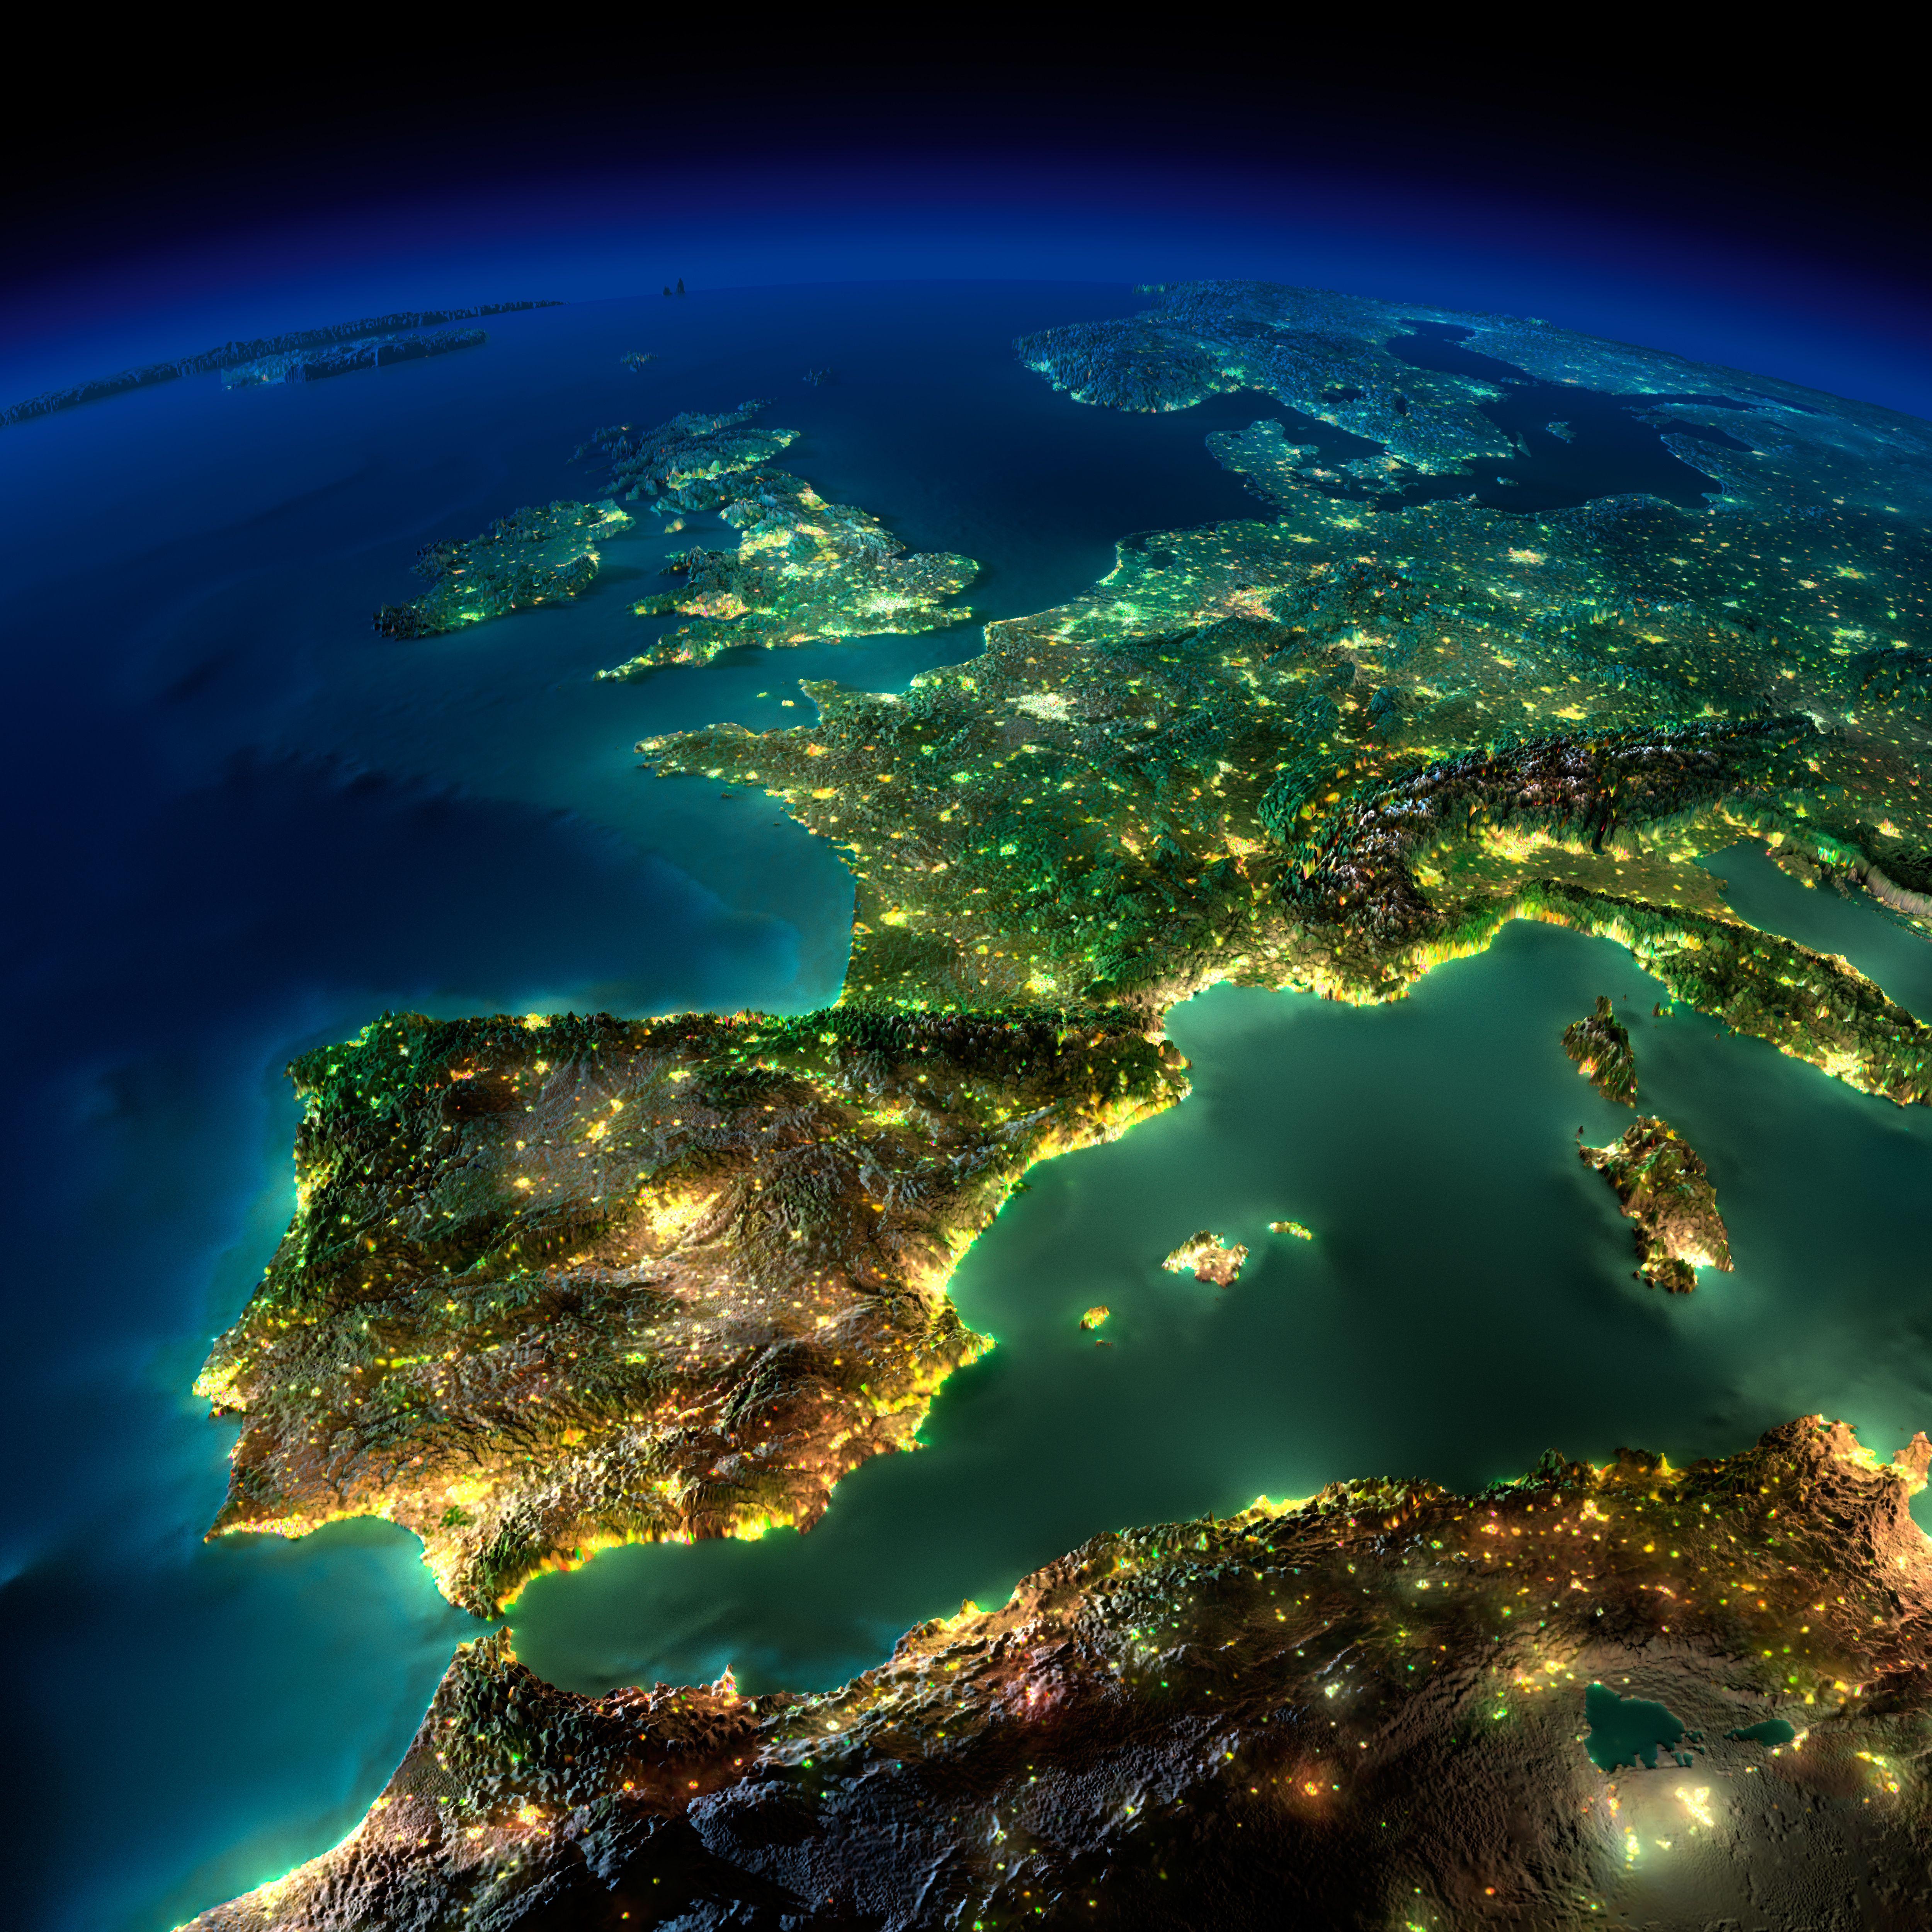 Satellite Images Europe Szukaj W Google Stream Pinterest - Satellite map of the world at night